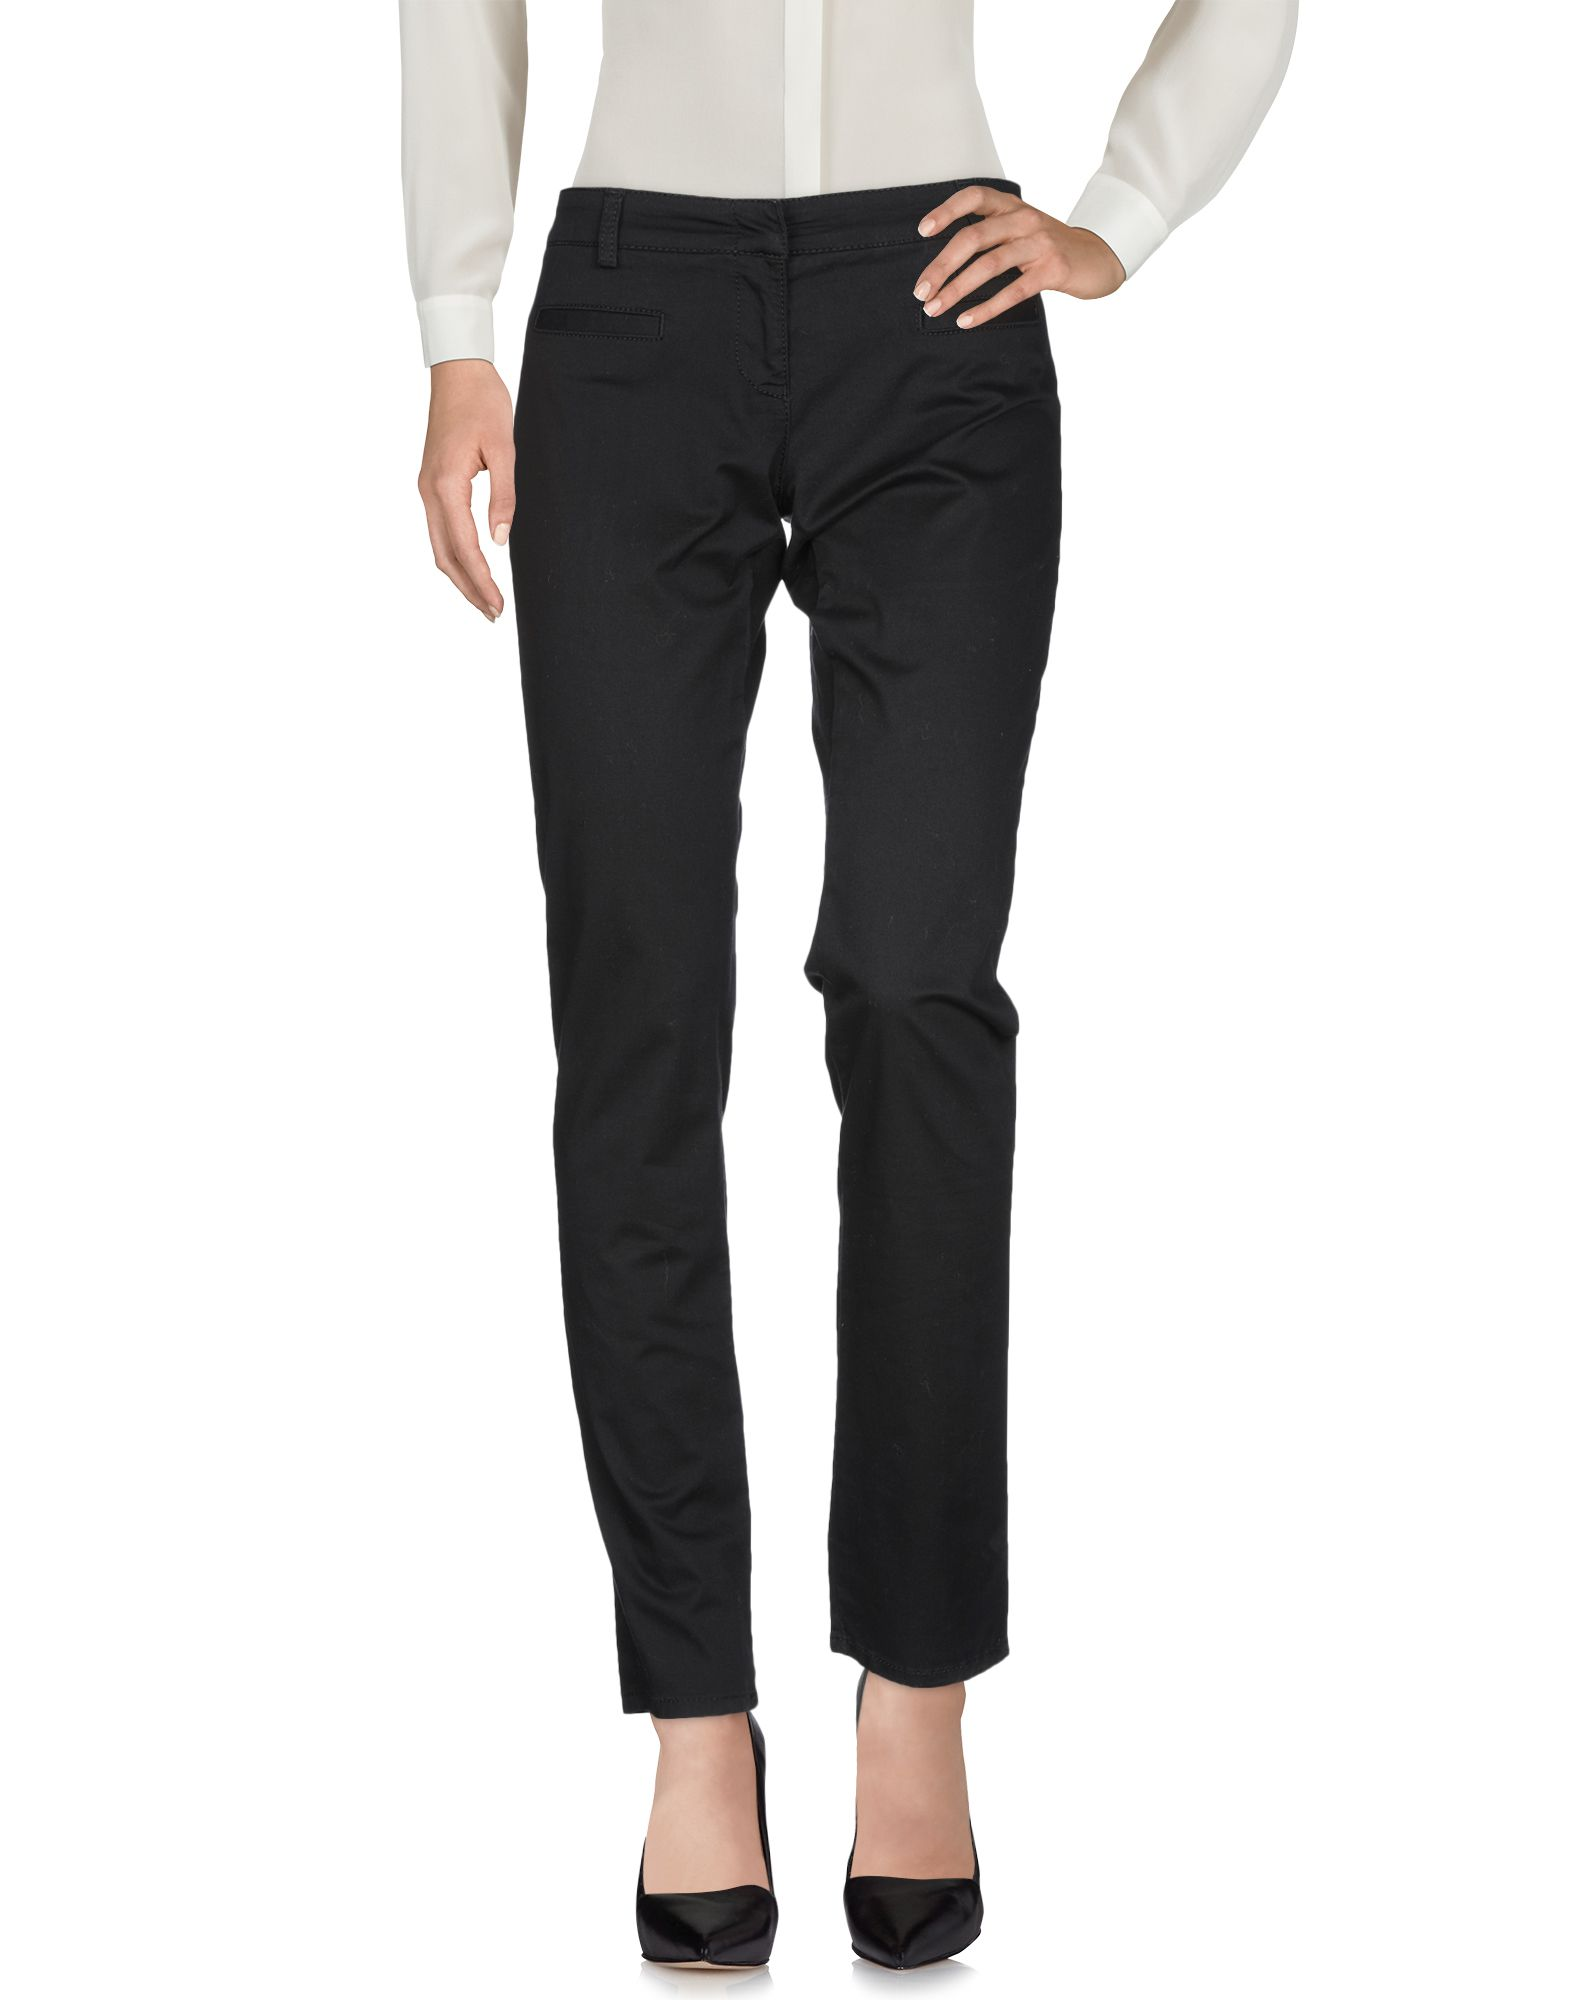 Pantalone Armani Jeans Jeans donna - 13213076OX